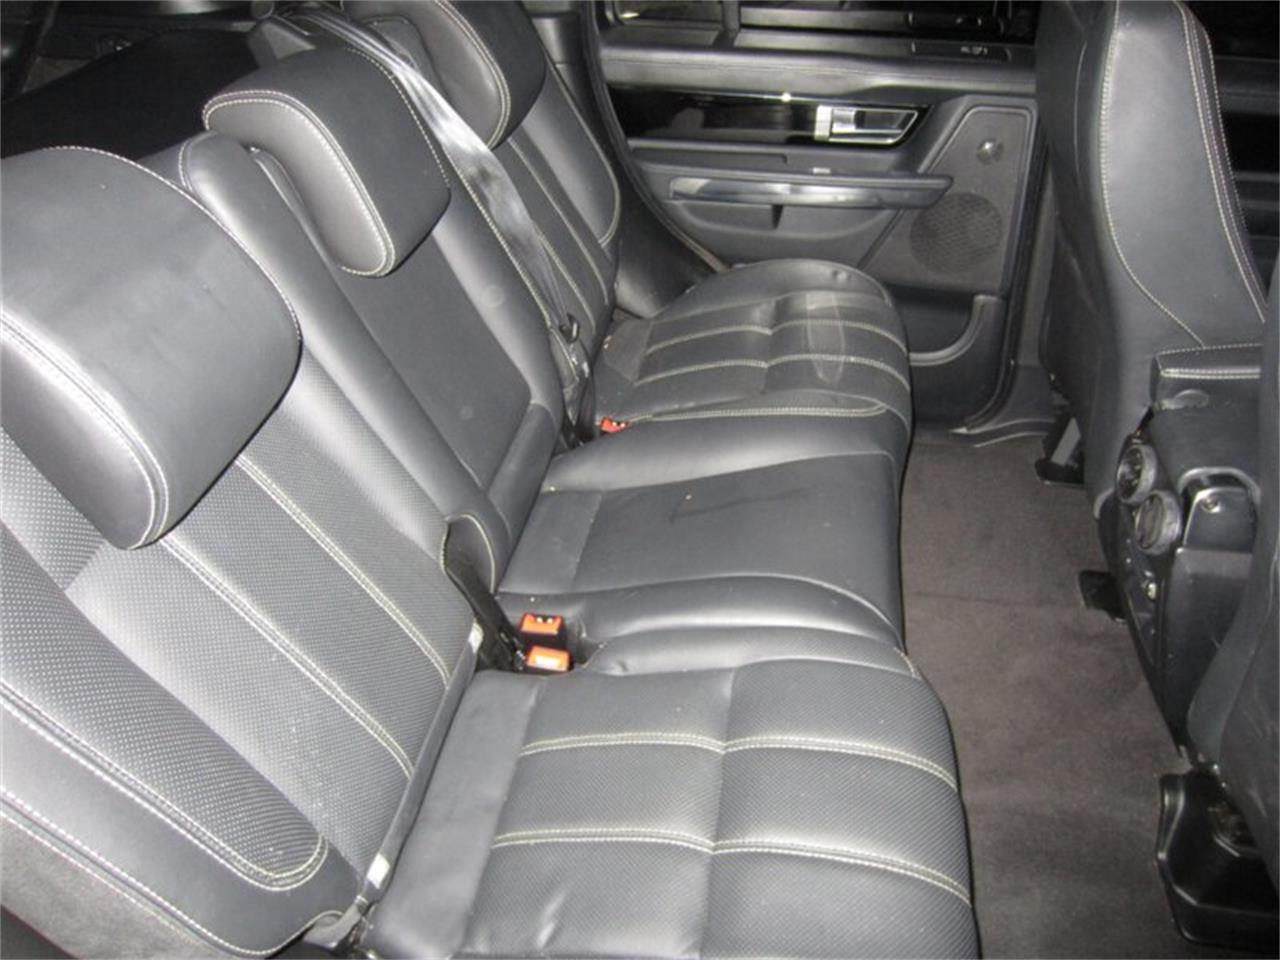 2012 Land Rover Range Rover Sport (CC-1416978) for sale in Delray Beach, Florida